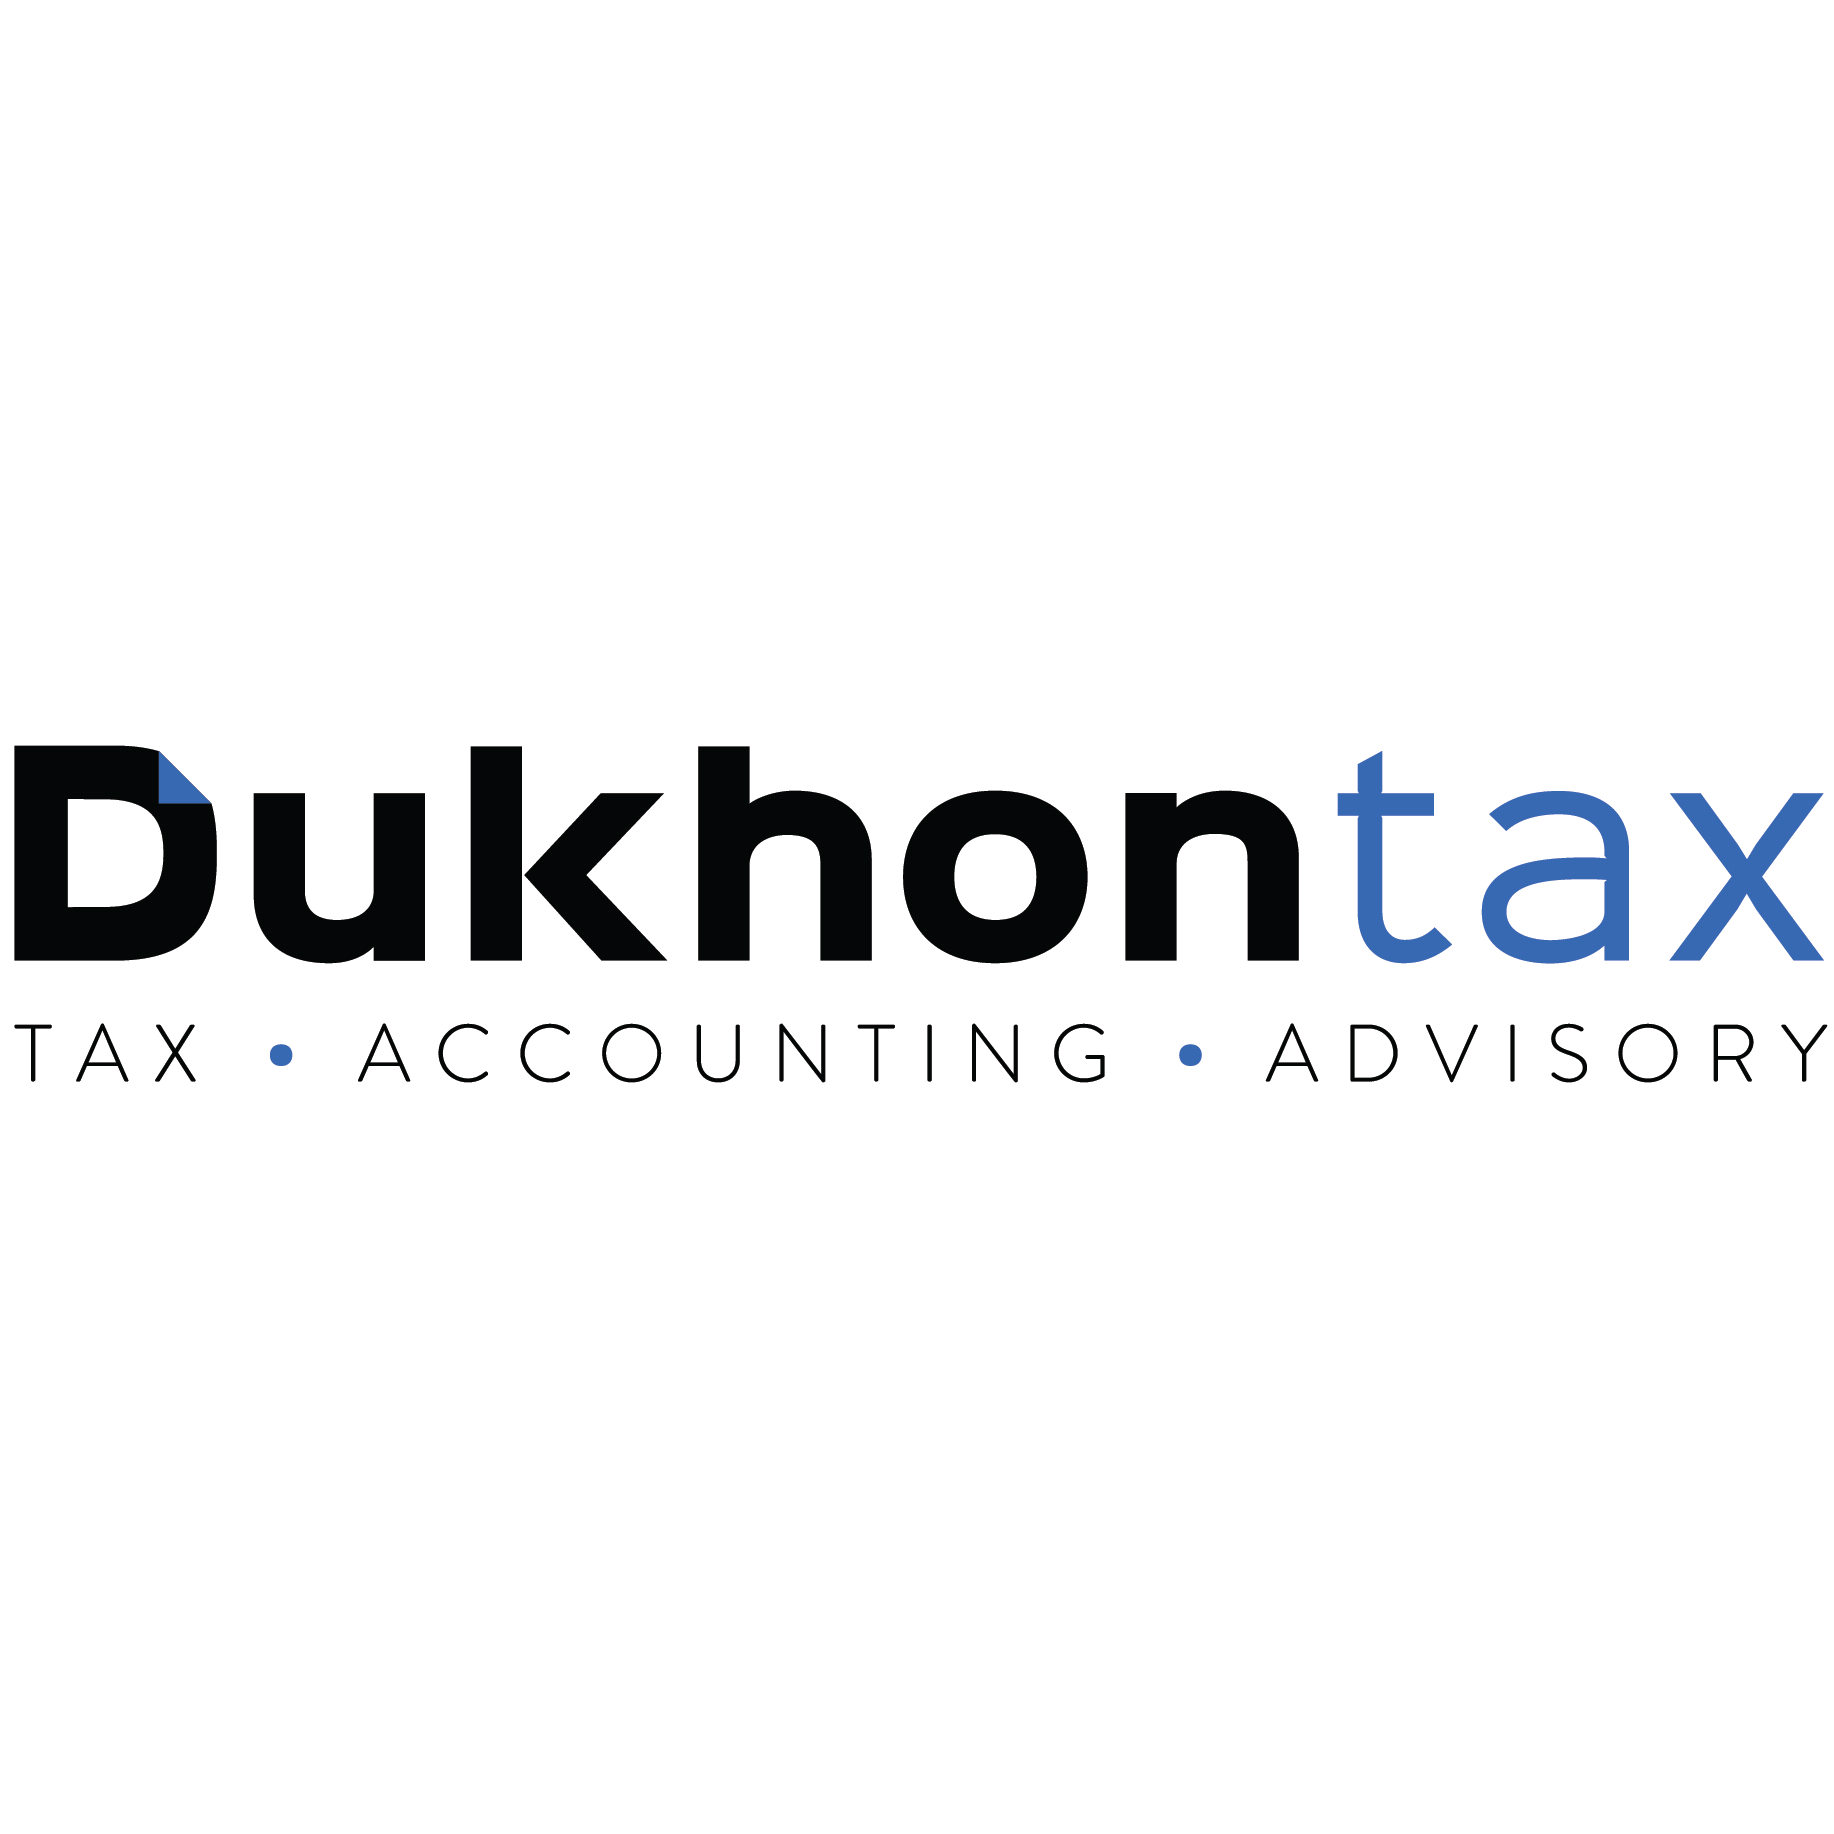 Dukhon Tax and Accounting LLC - Brighton, MA 02135 - (617)651-0531 | ShowMeLocal.com